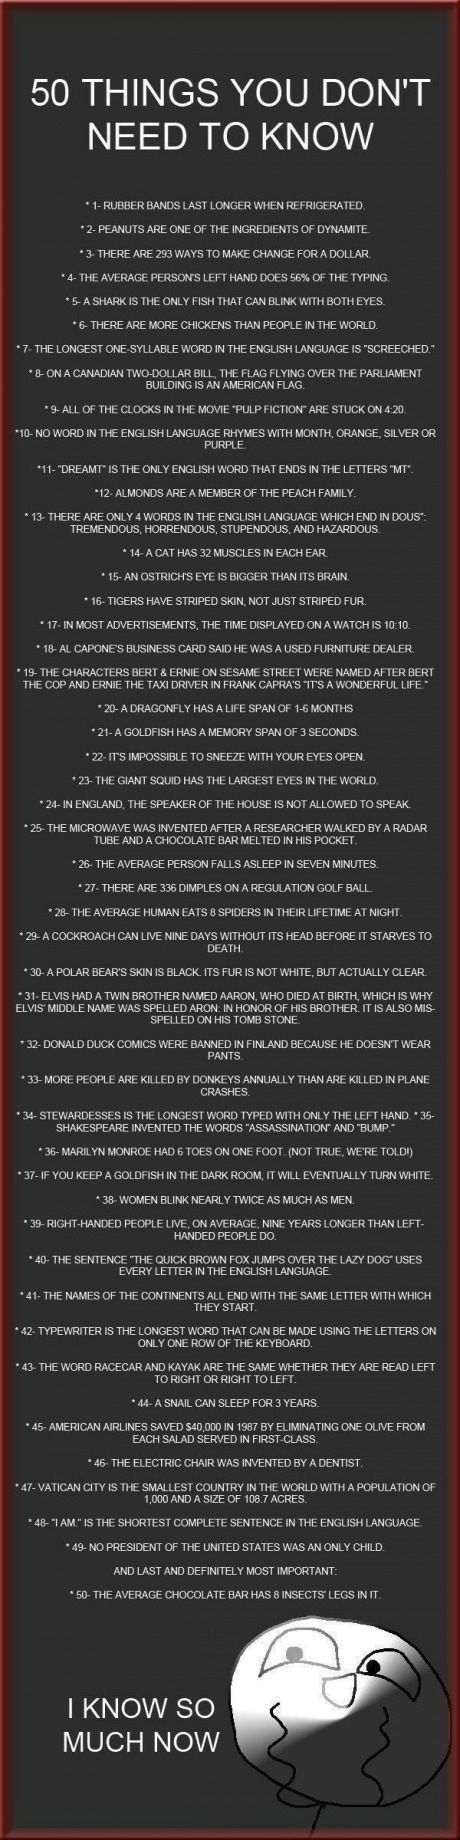 50 random facts